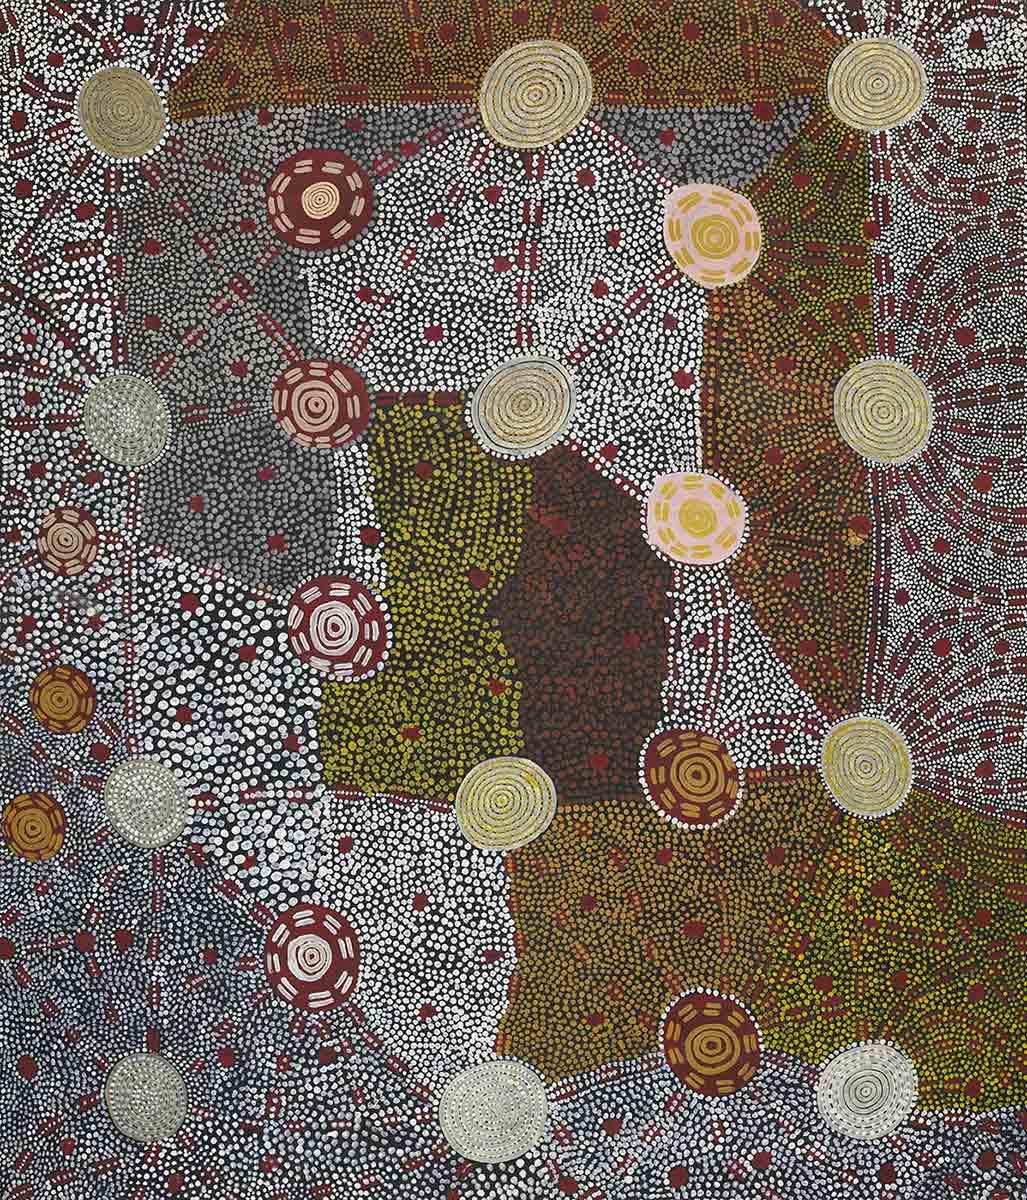 Watunuma (Warturnuma) (Flying Ant Dreaming) 1976 by Kaapa Tjampitjinpa. - click to view larger image